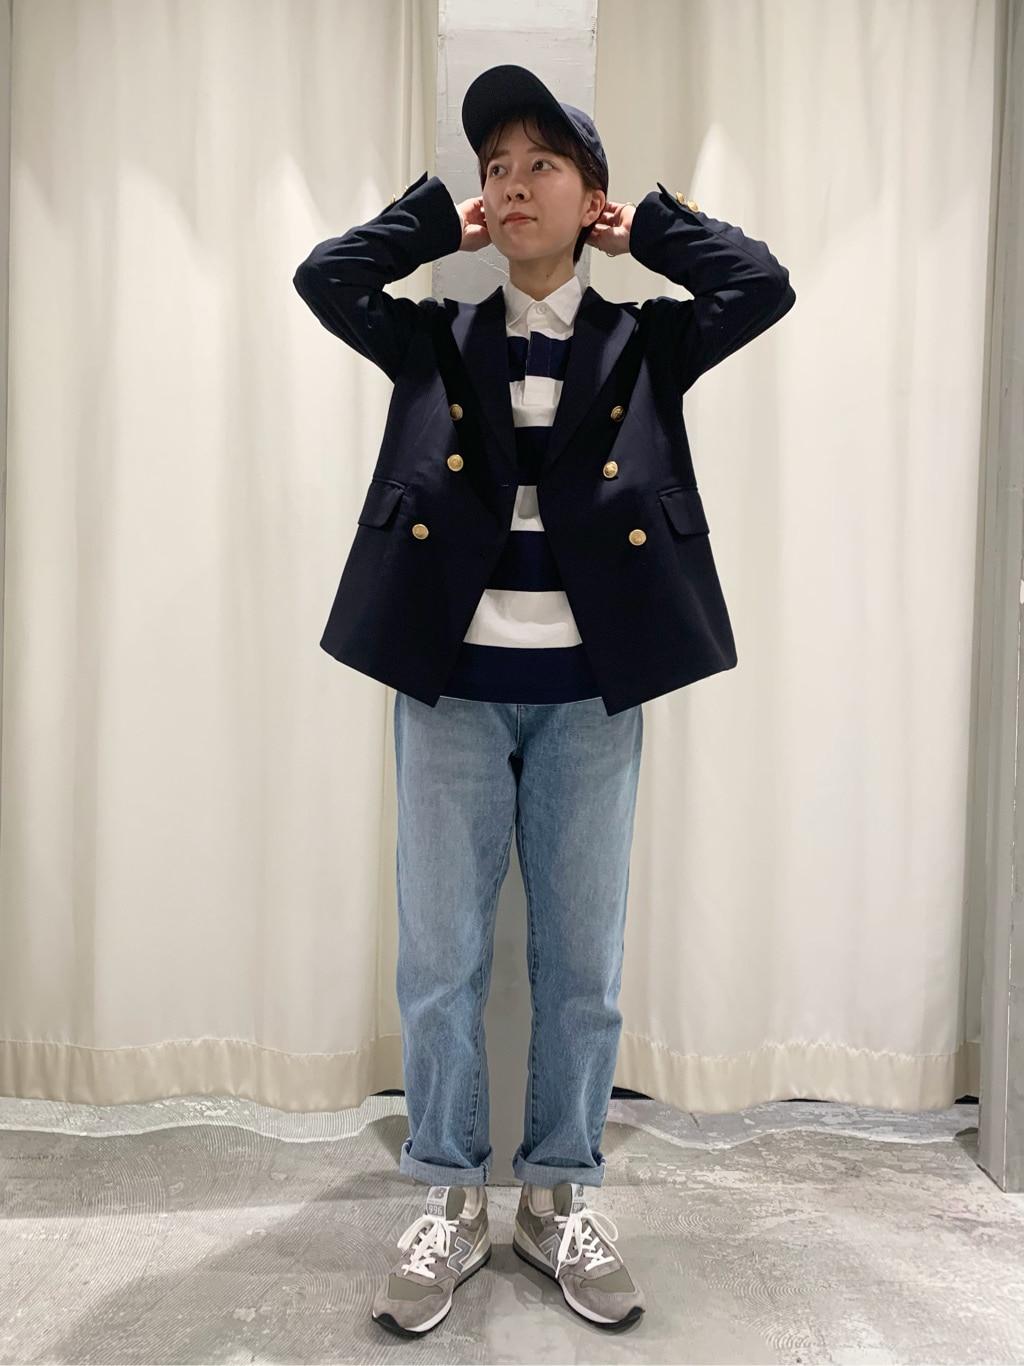 - CHILD WOMAN CHILD WOMAN , PAR ICI ルミネ横浜 身長:158cm 2021.02.26